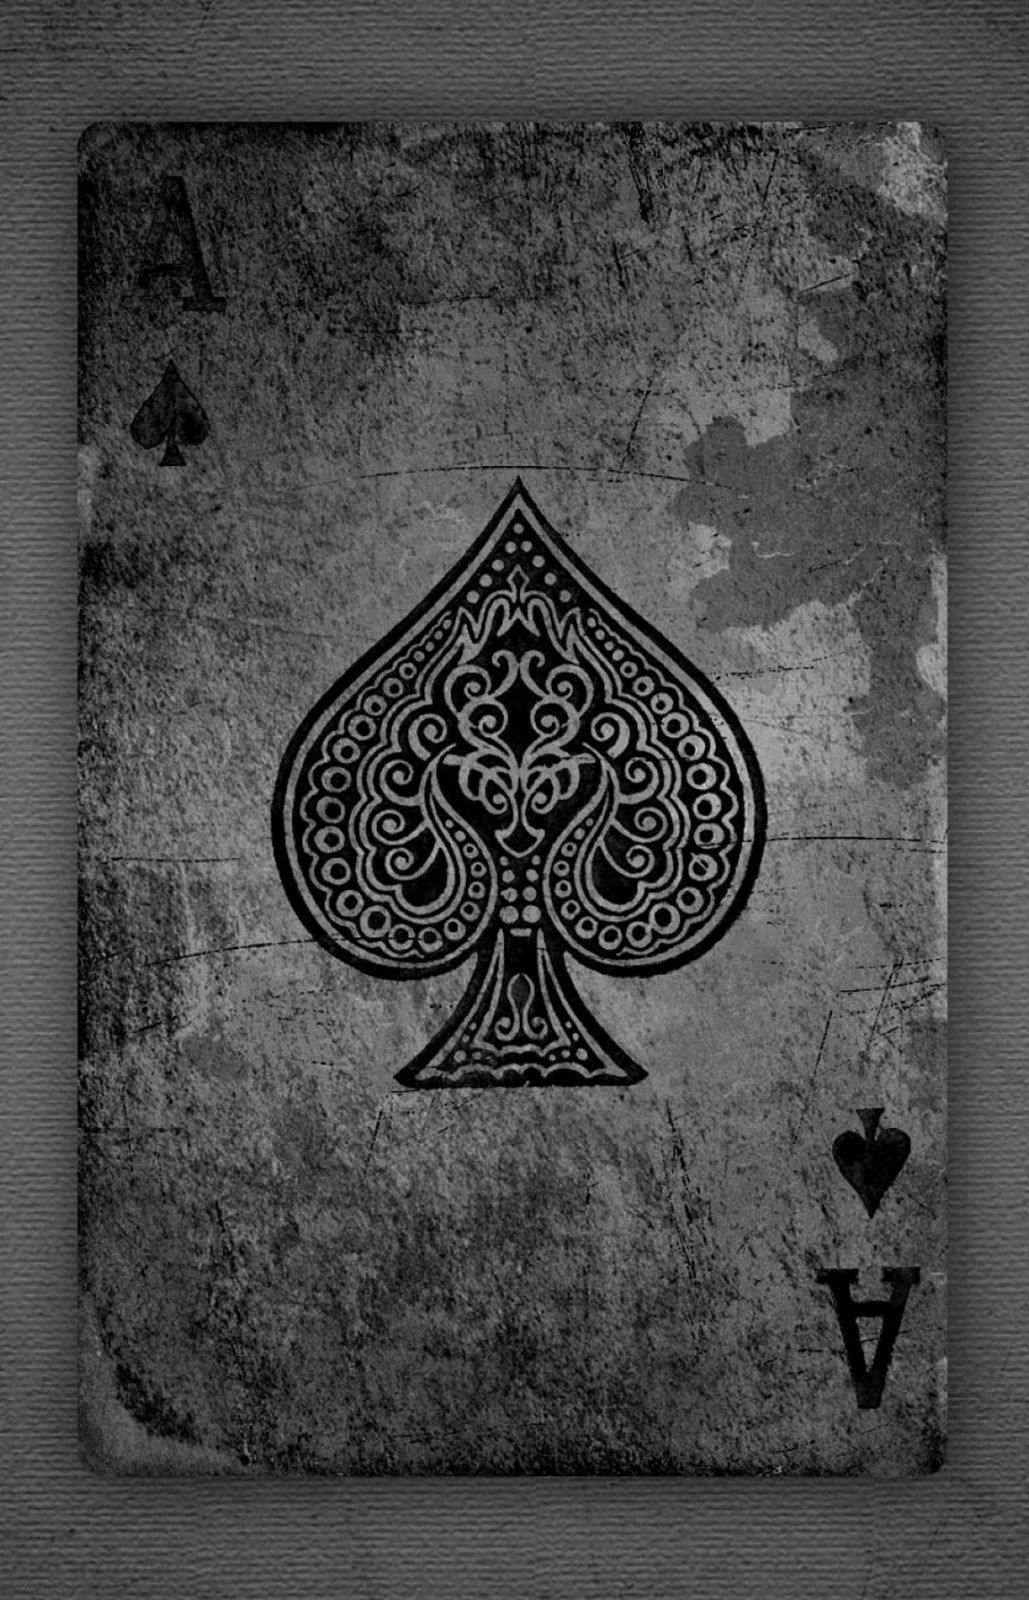 Ace Card Wallpaper : wallpaper, Wallpapers, WallpaperDog